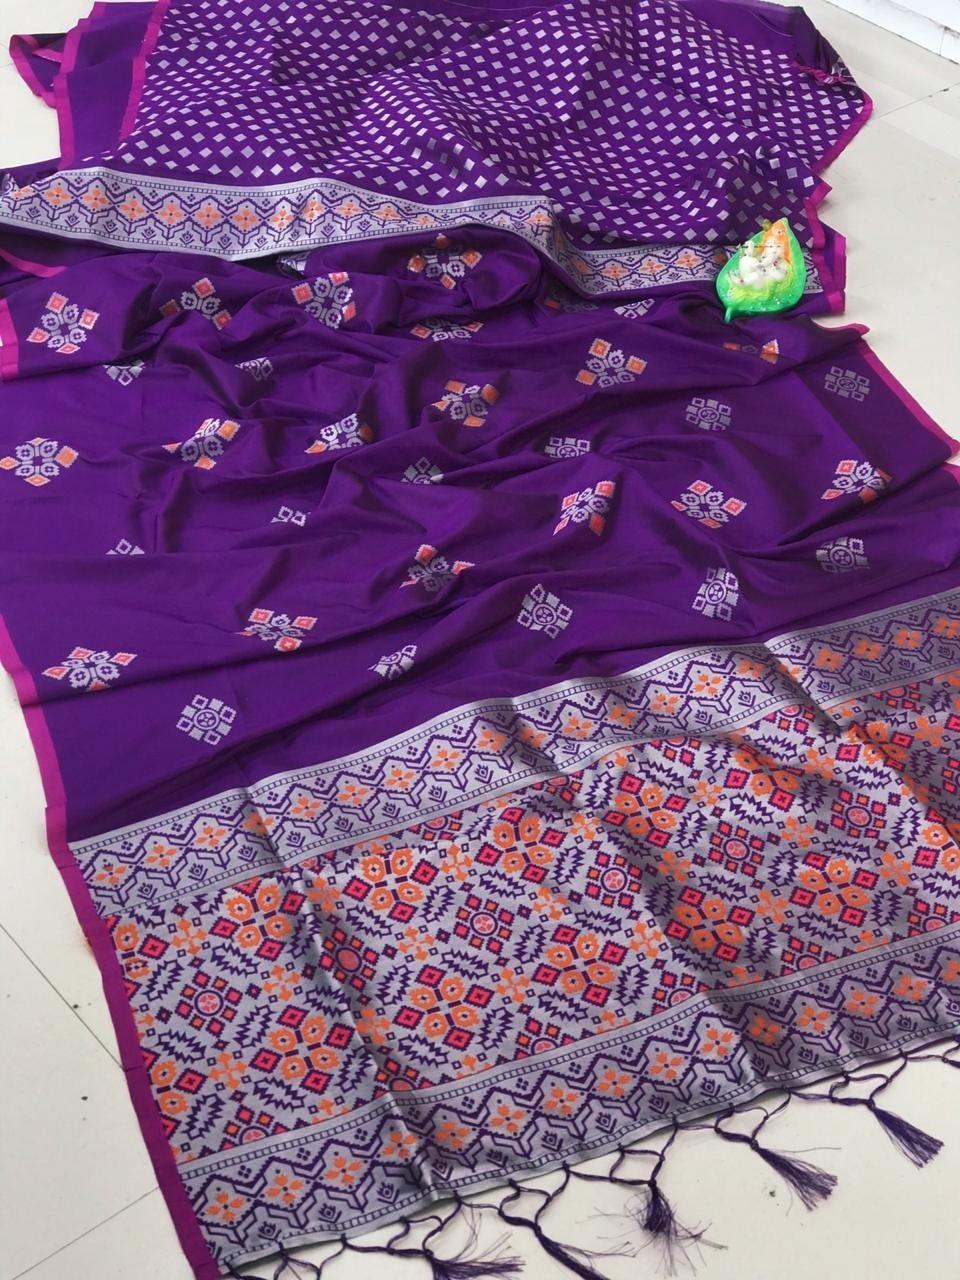 dvanza Beautiful purple Soft And Silky Litchi Silk Saree dvz0002320